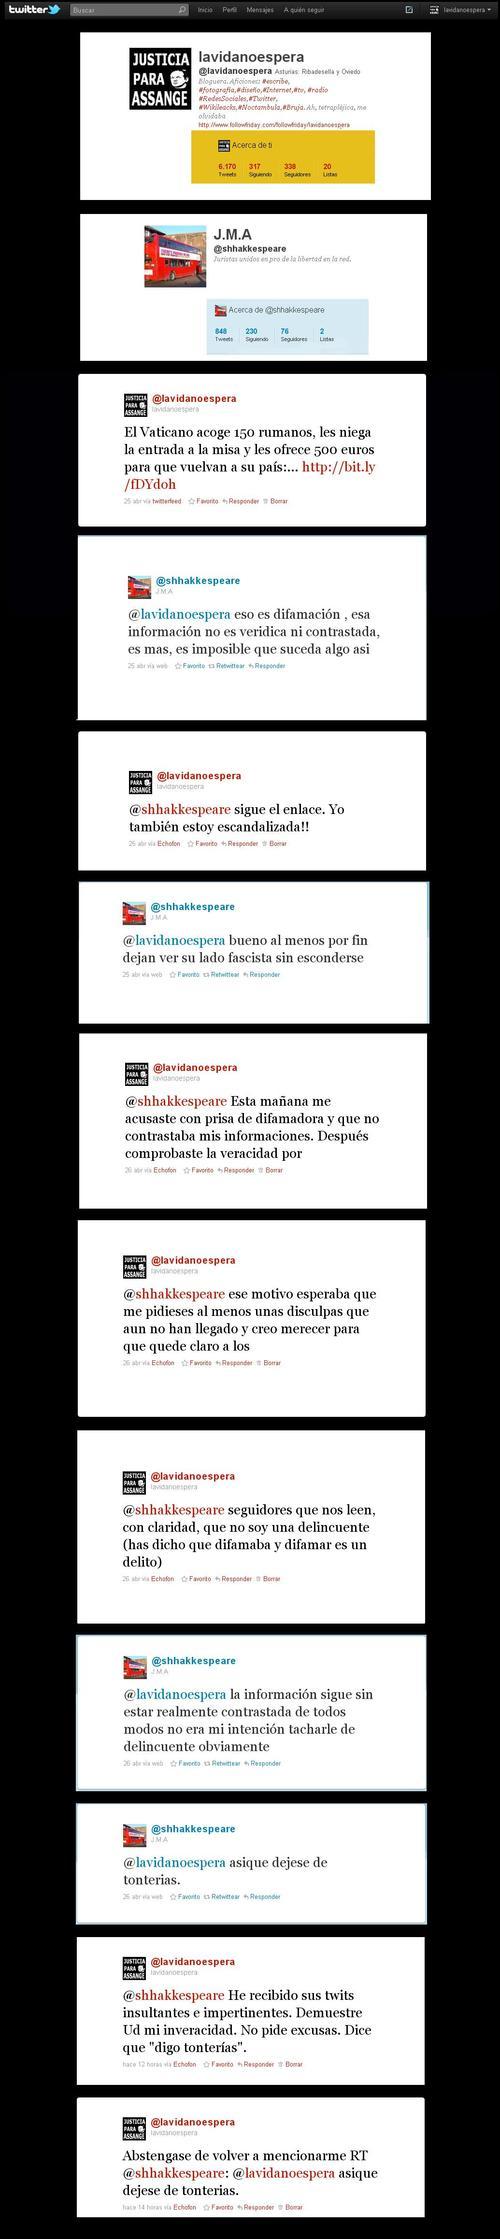 Polemica_en_el_twitter